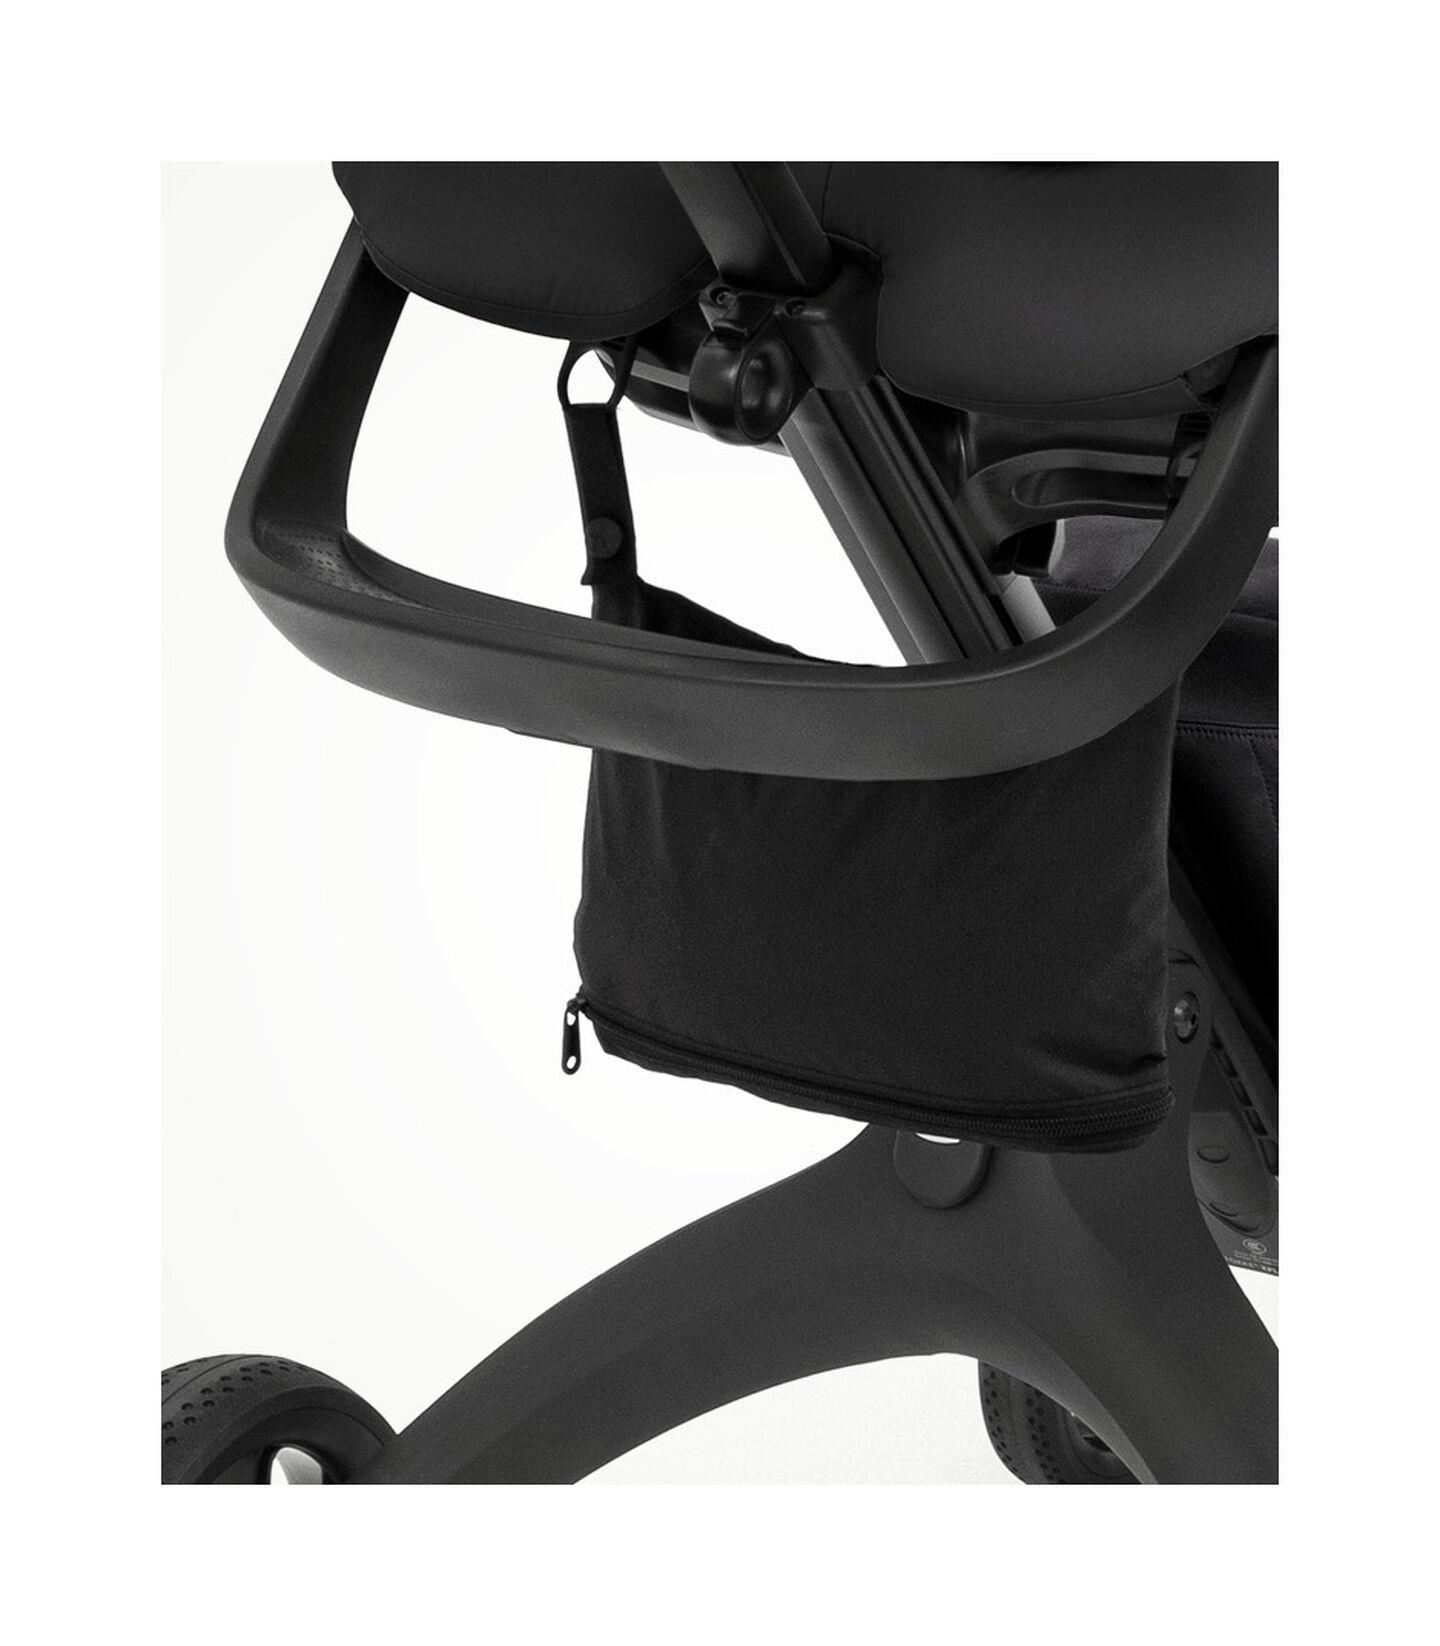 Stokke® Xplory® X Rain Cover Black, Черный, mainview view 2